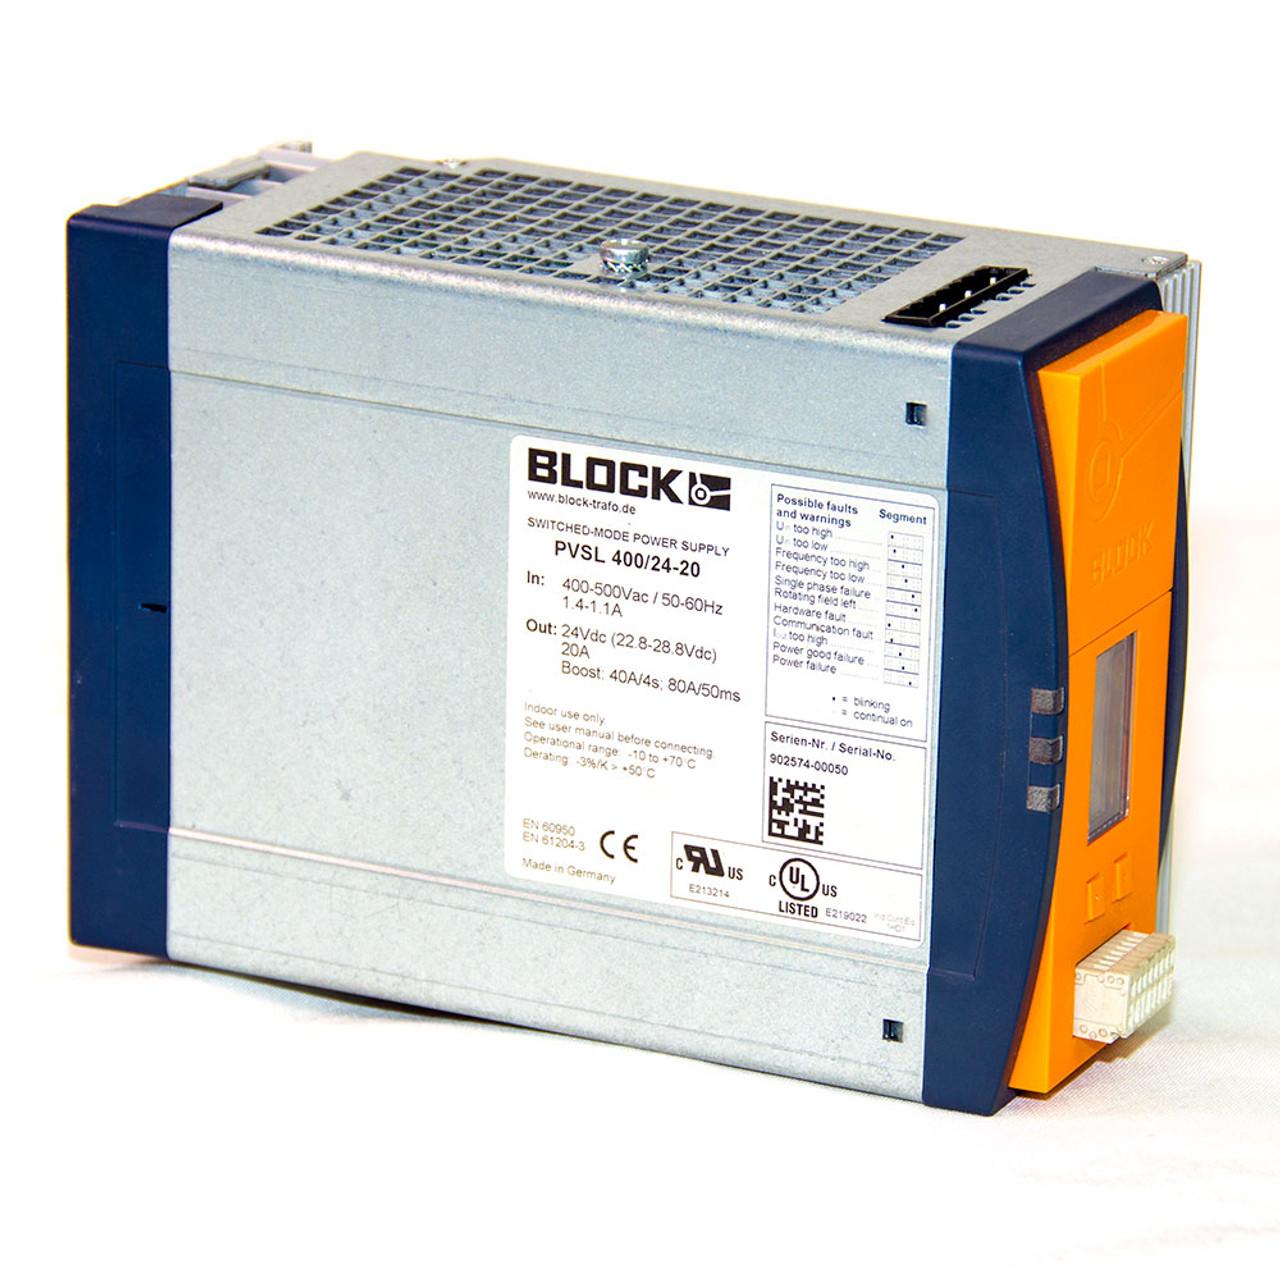 Block PVSL 400/24-20 Basic Switched Mode DIN Rail Mount Power Supply